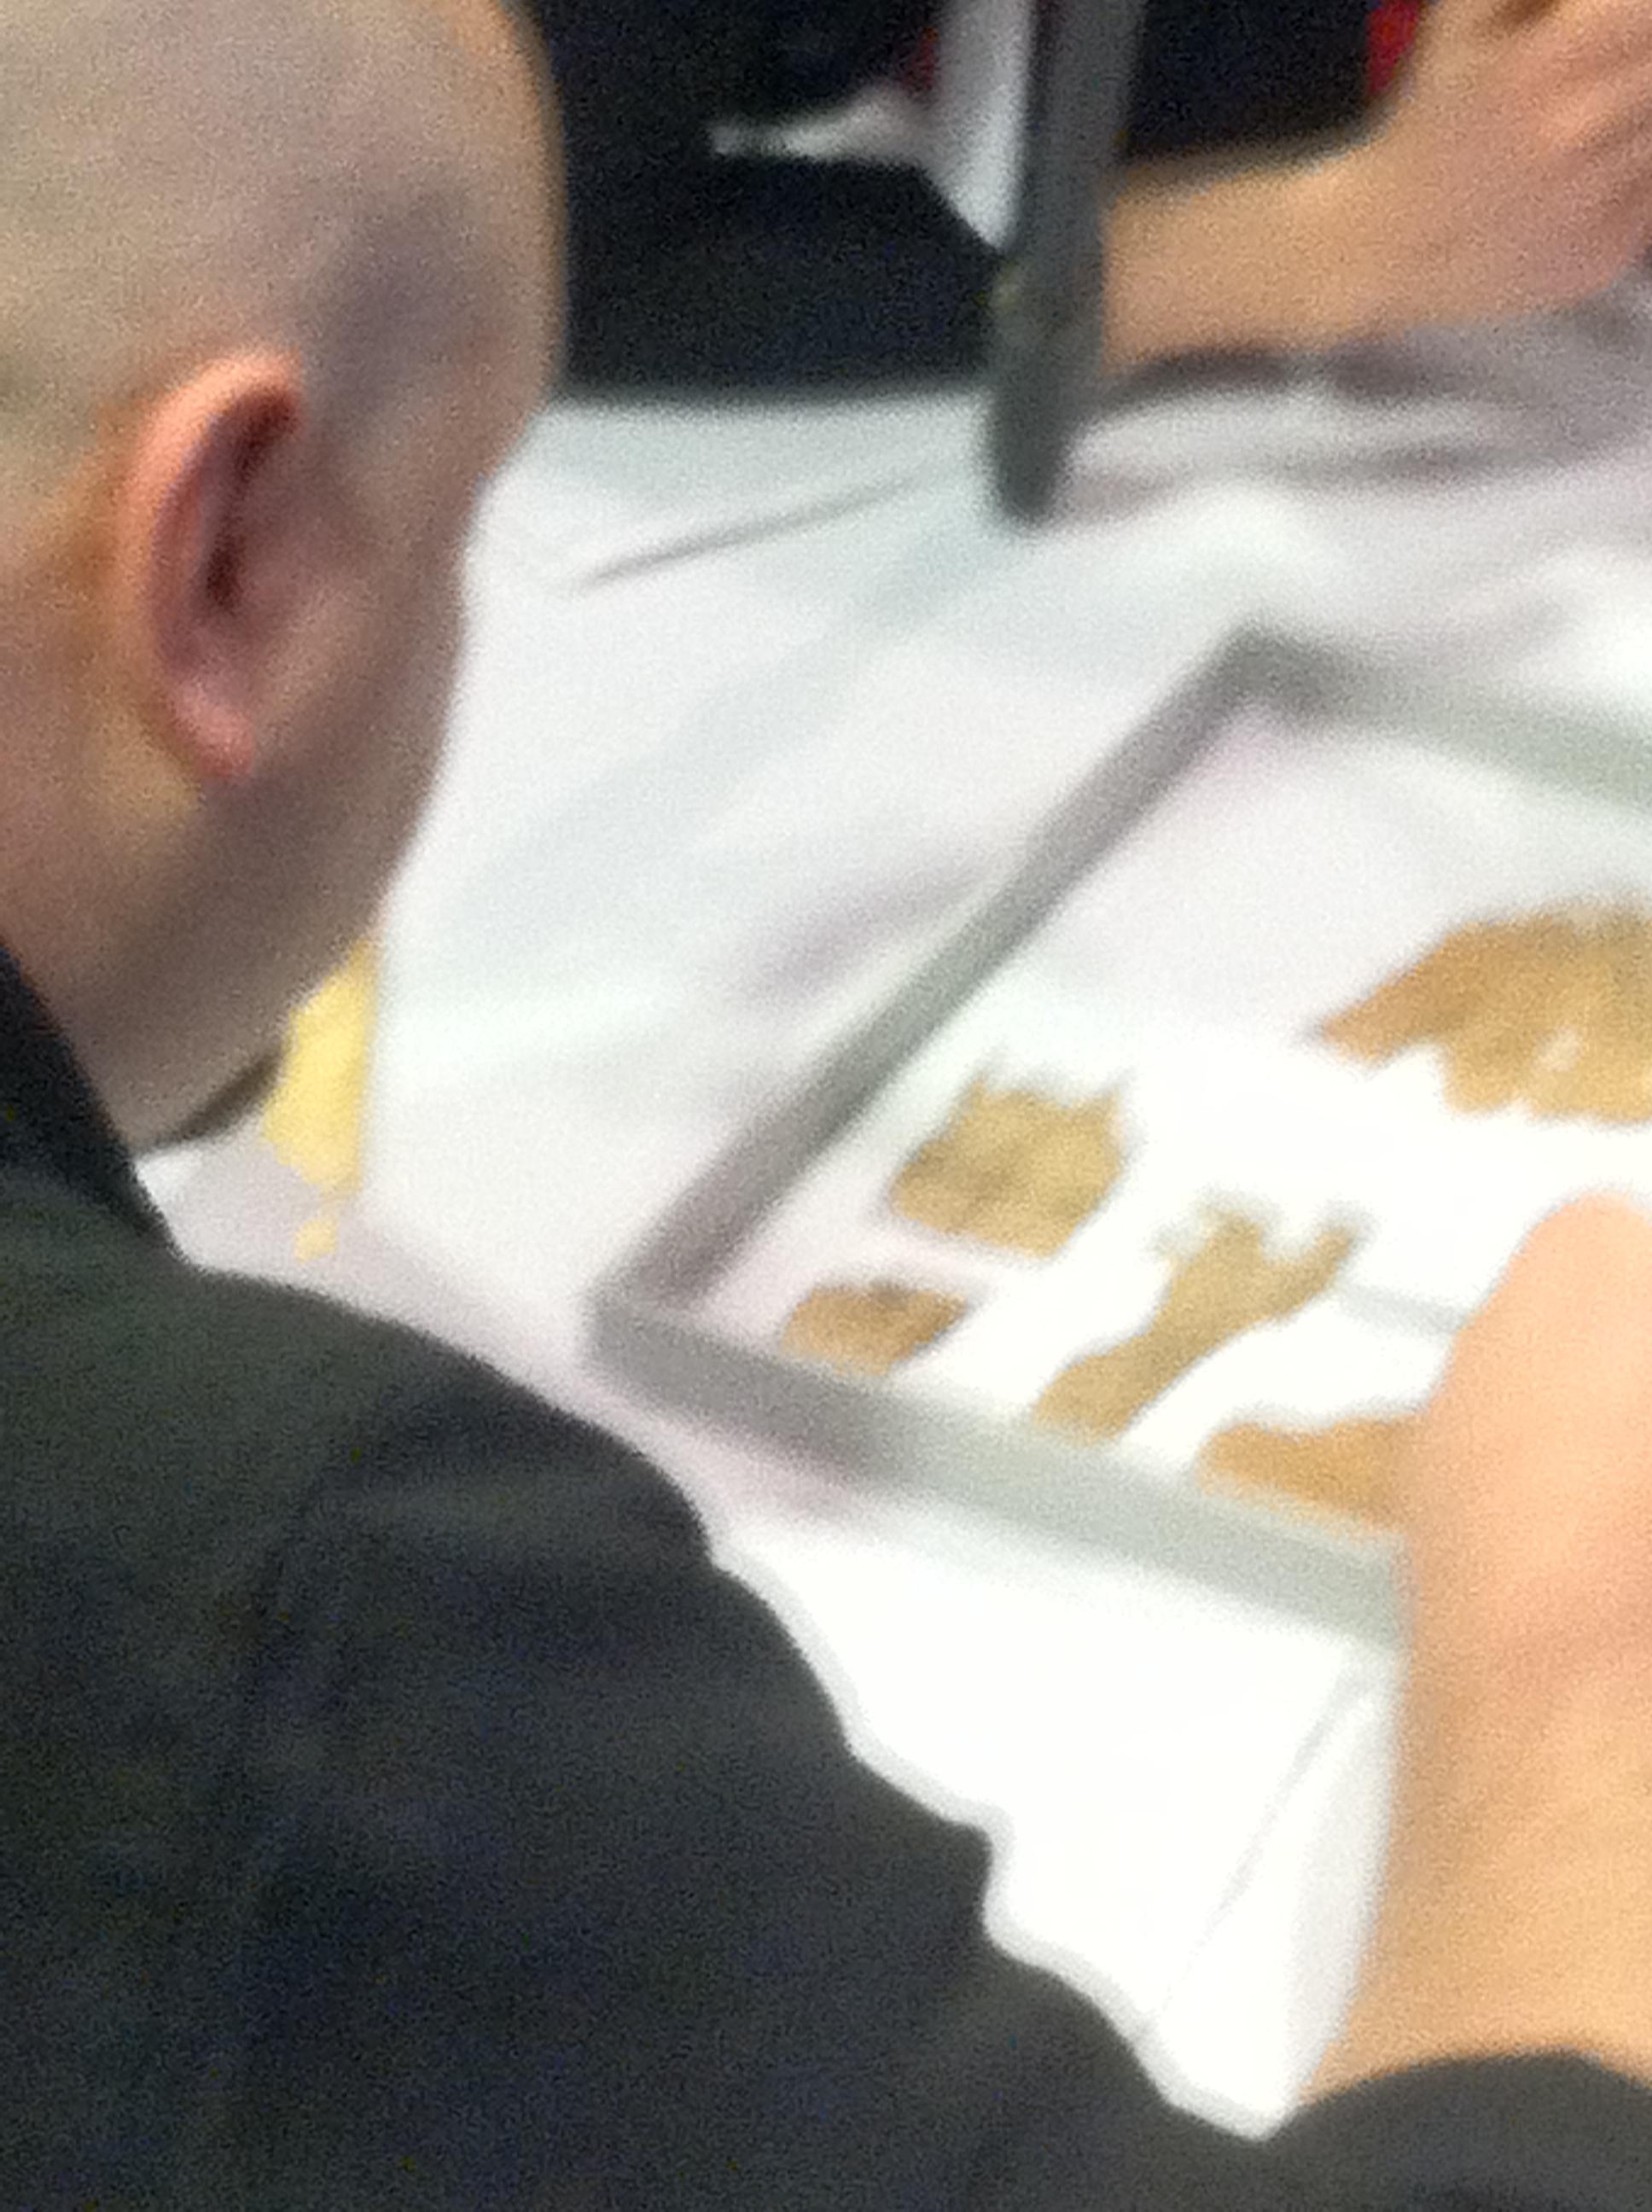 Assisting with ancient manuscript fragments3